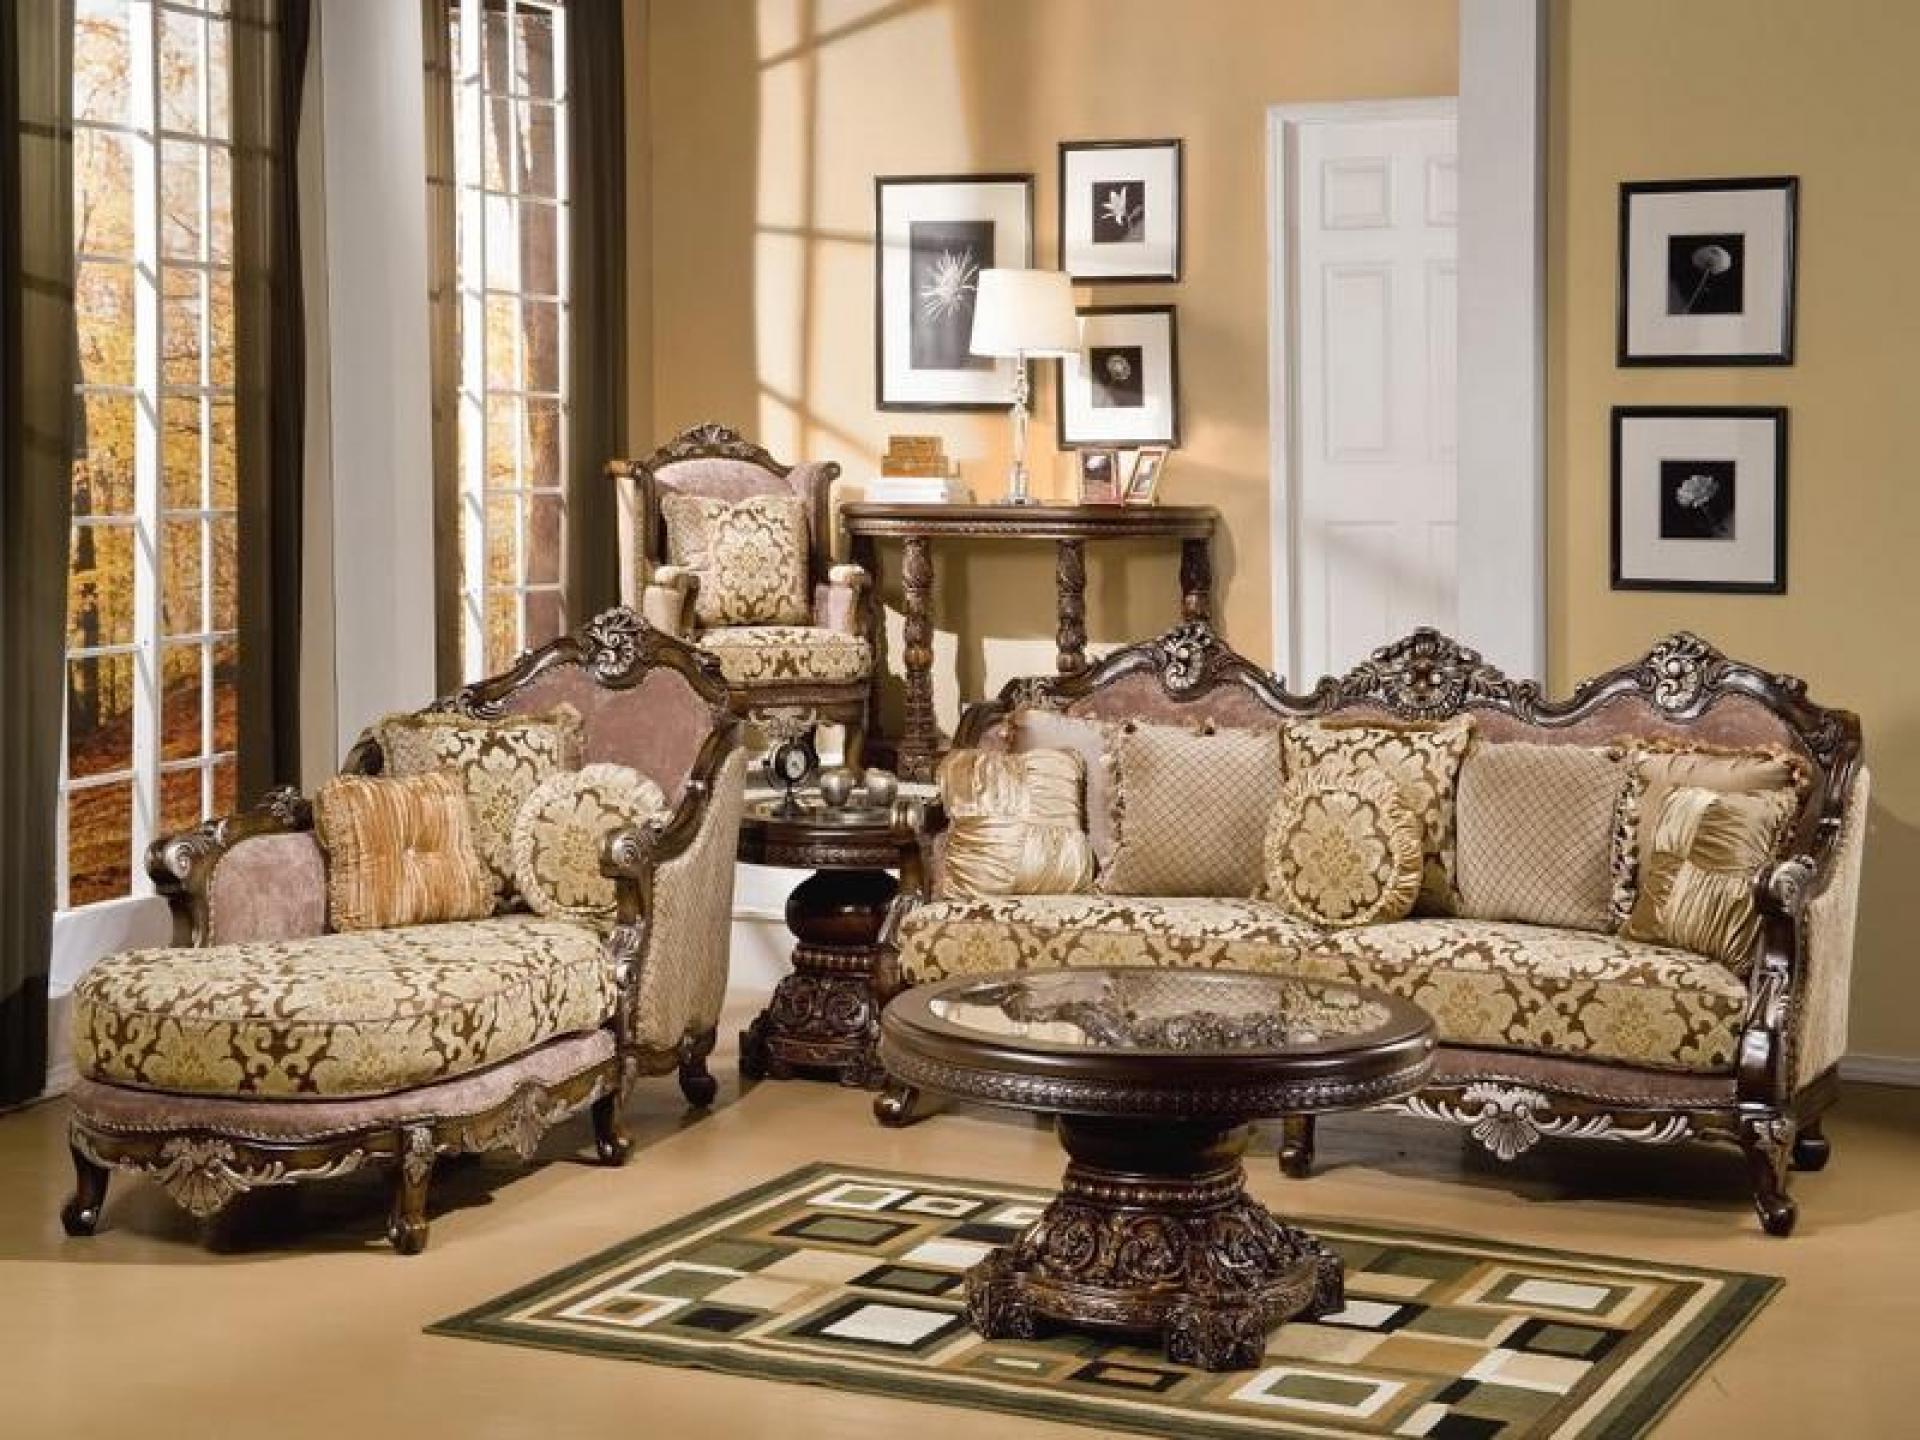 sofa lounge for living room antique furniture for living rooms curtain sofa carpet tea table pillow  table MPOJLXP